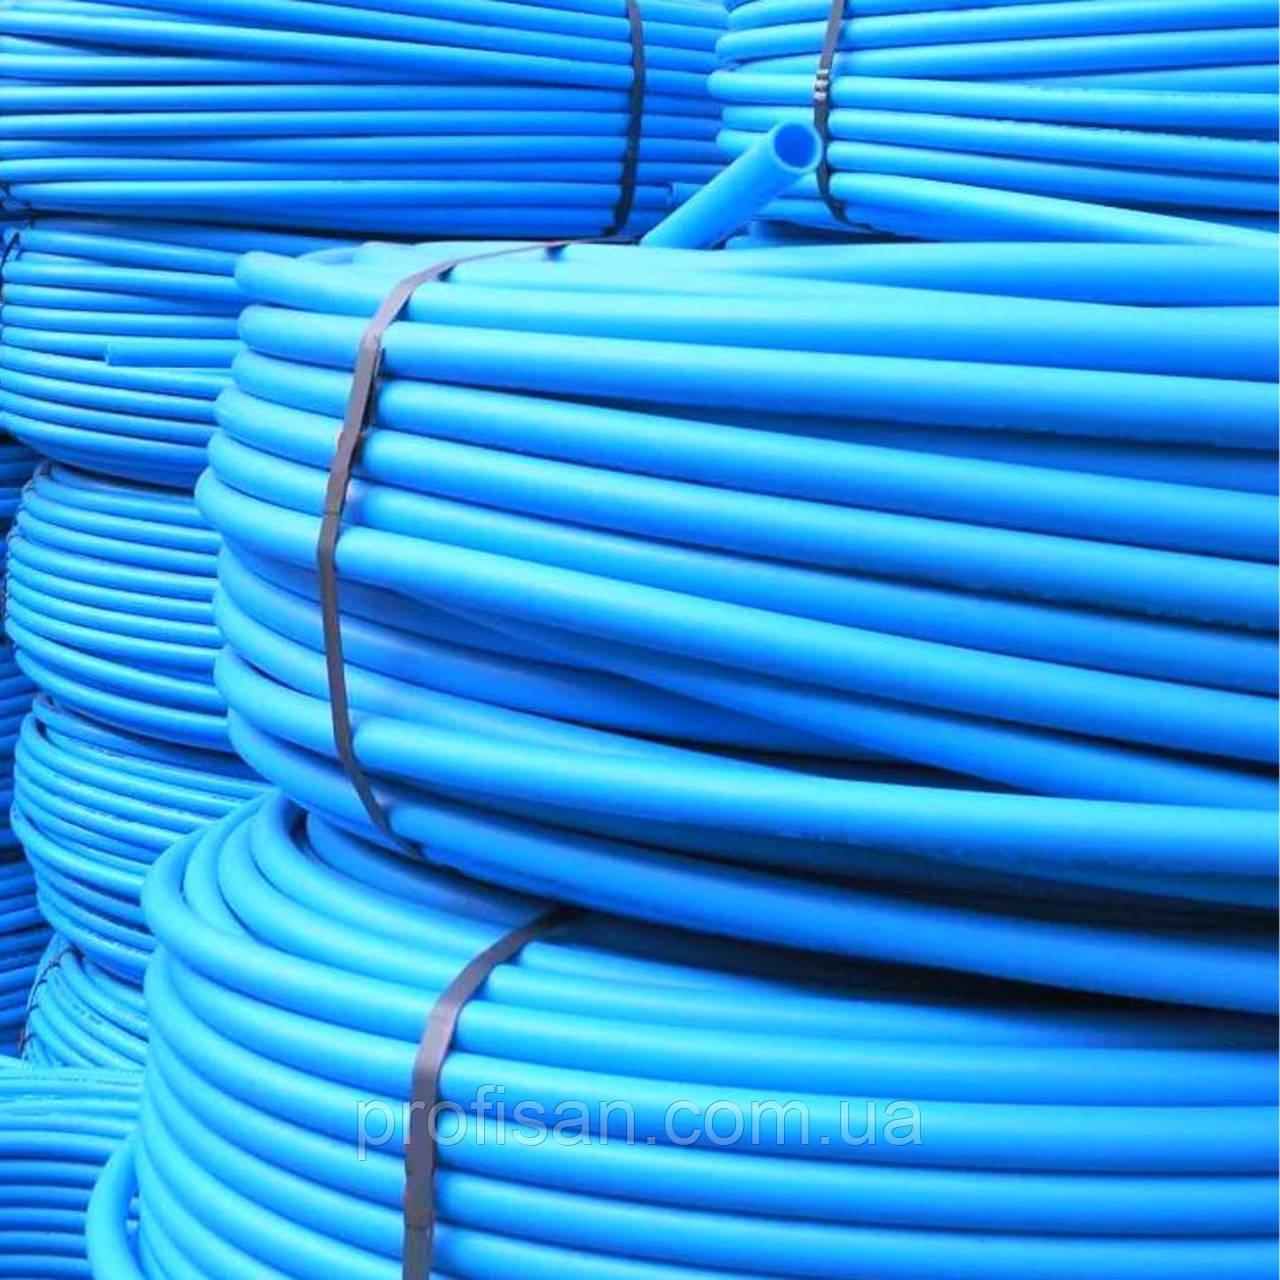 Труба ПЭ EKO-MT для водопровода (синяя) ф 50x3.7мм PN 10 (Польша)